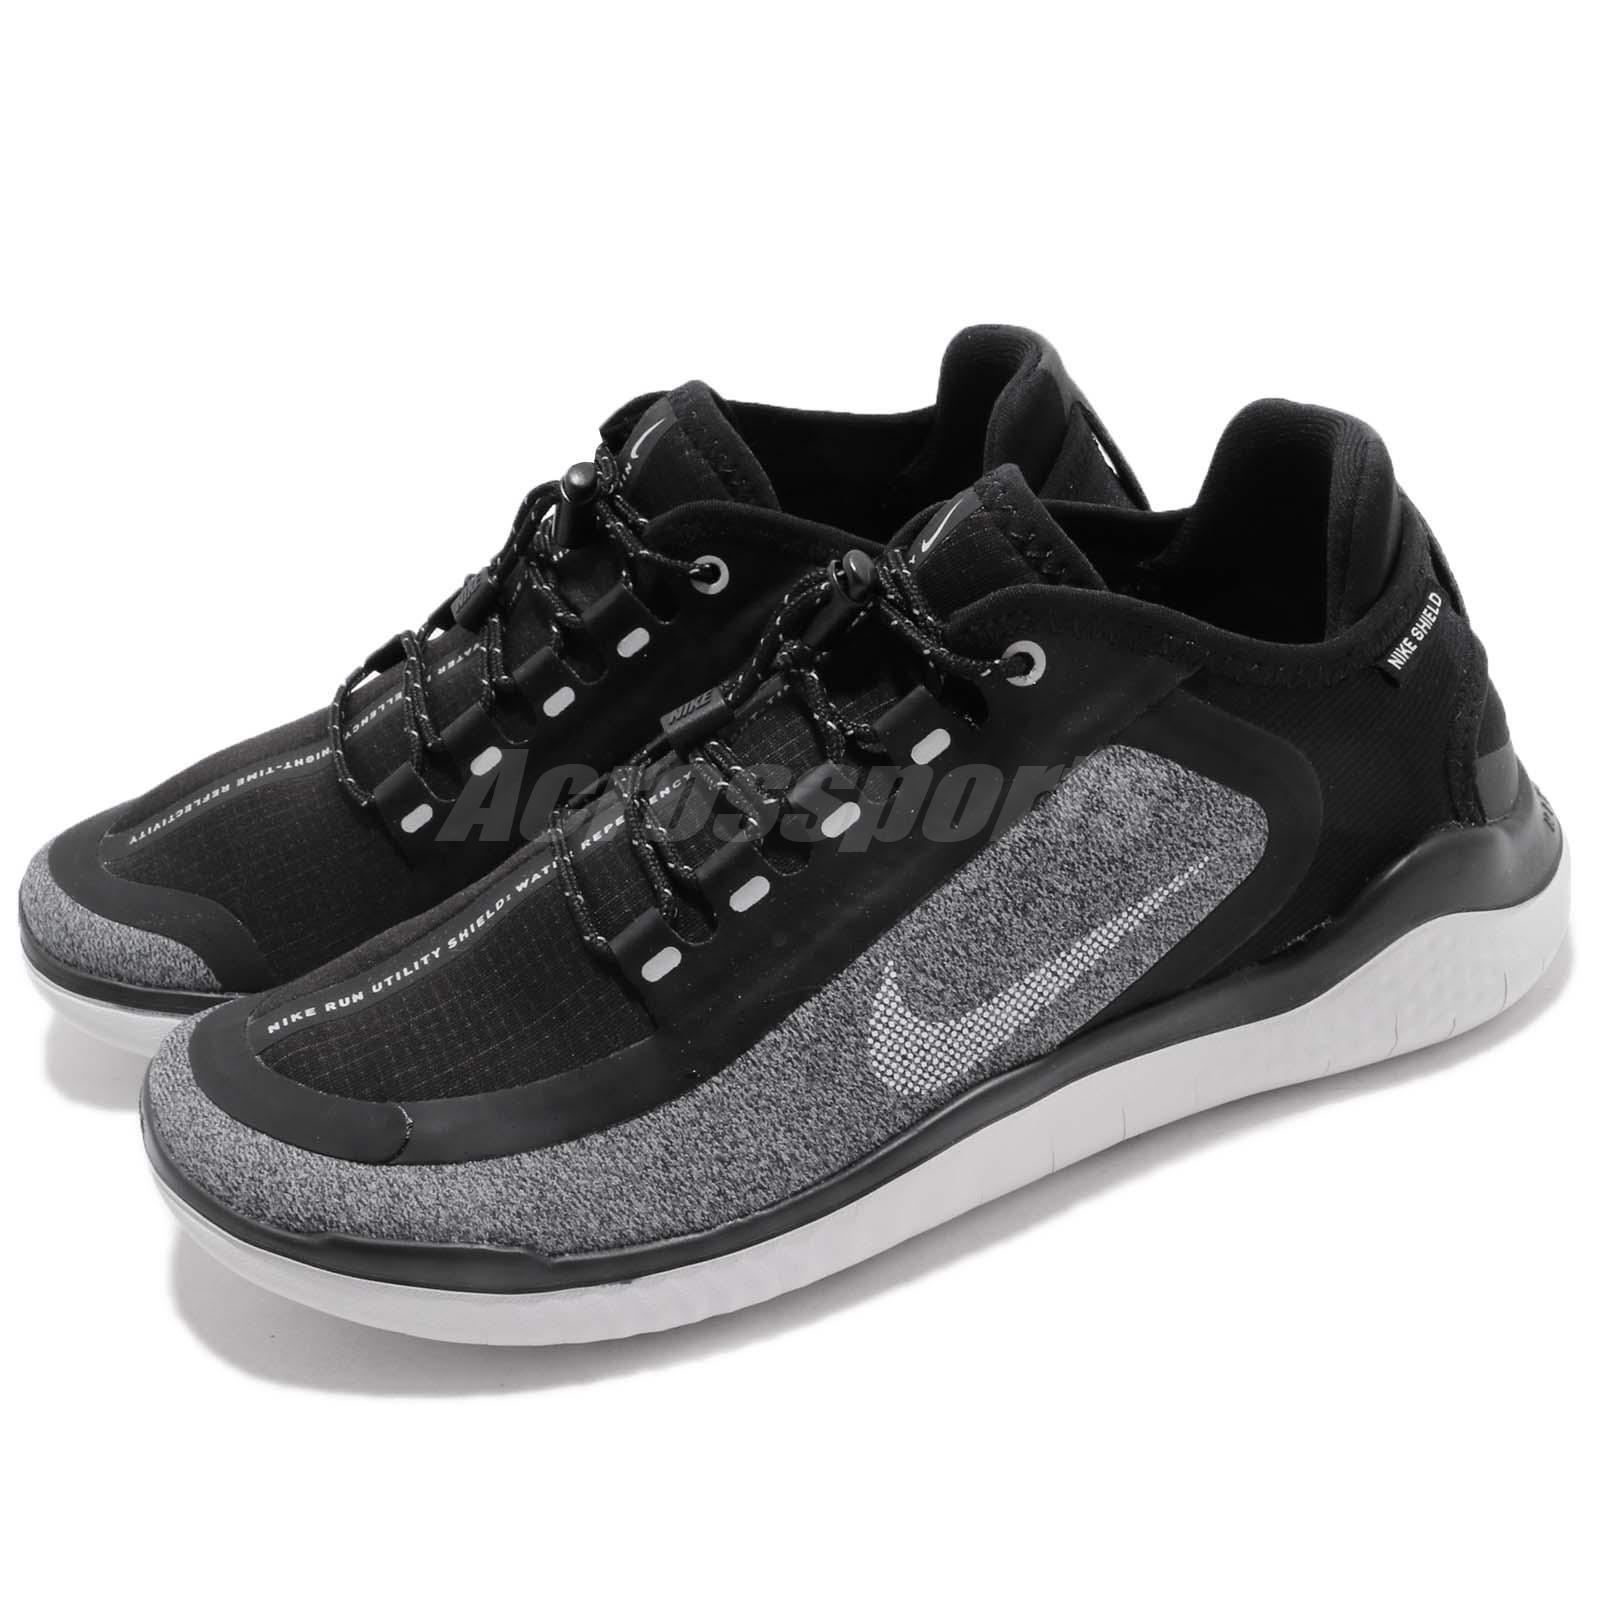 official photos 0607e 777fd Nike Nike Nike Wmns Free RN 2018 Shield Black White Grey WoHommes Running  Shoes AJ1978-002 1903e2